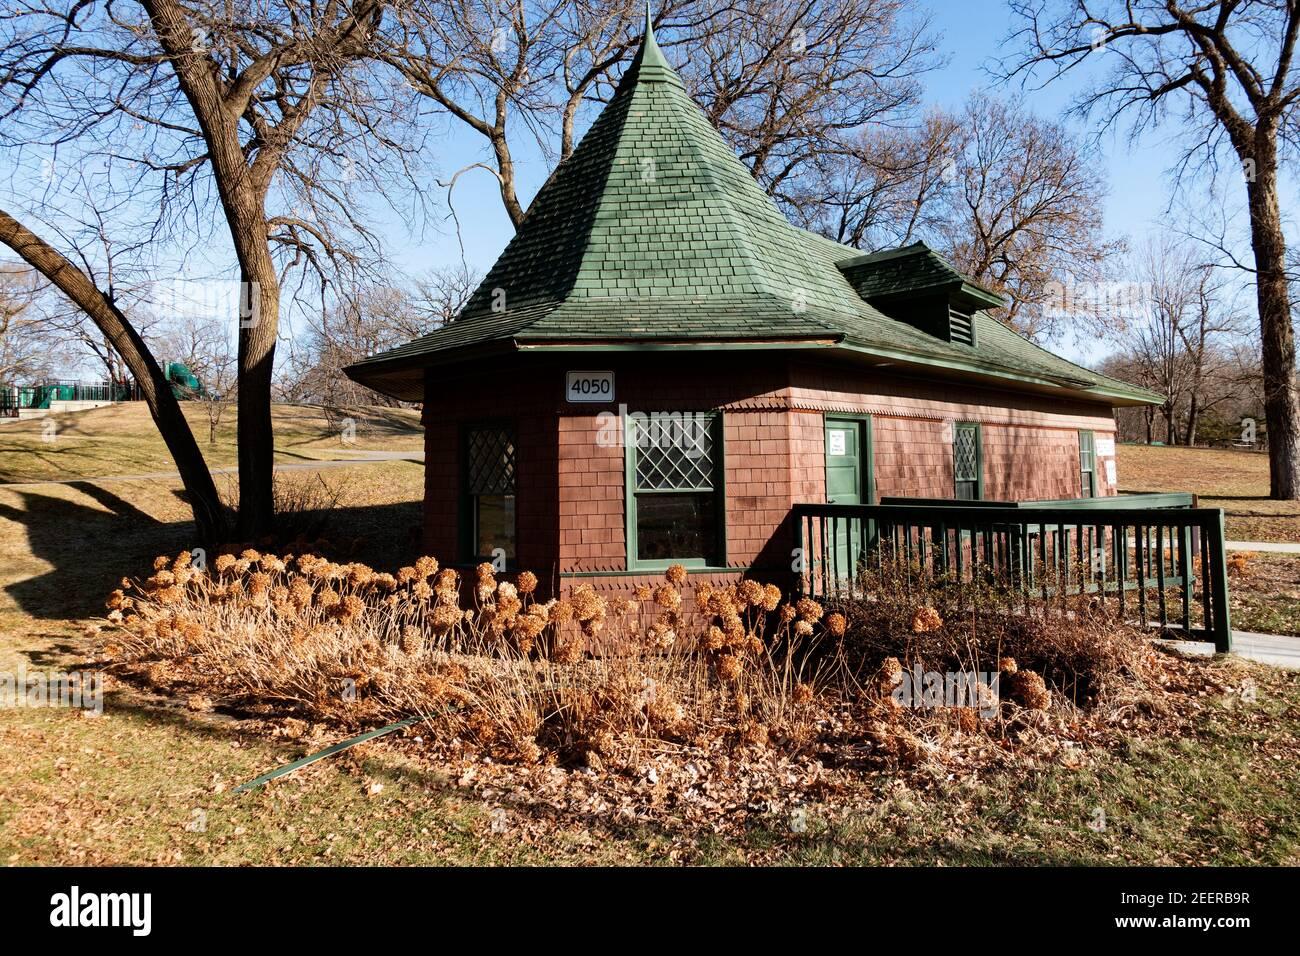 Quaint building at Lake Harriet that has restrooms. Minneapolis Minnesota MN USA Stock Photo